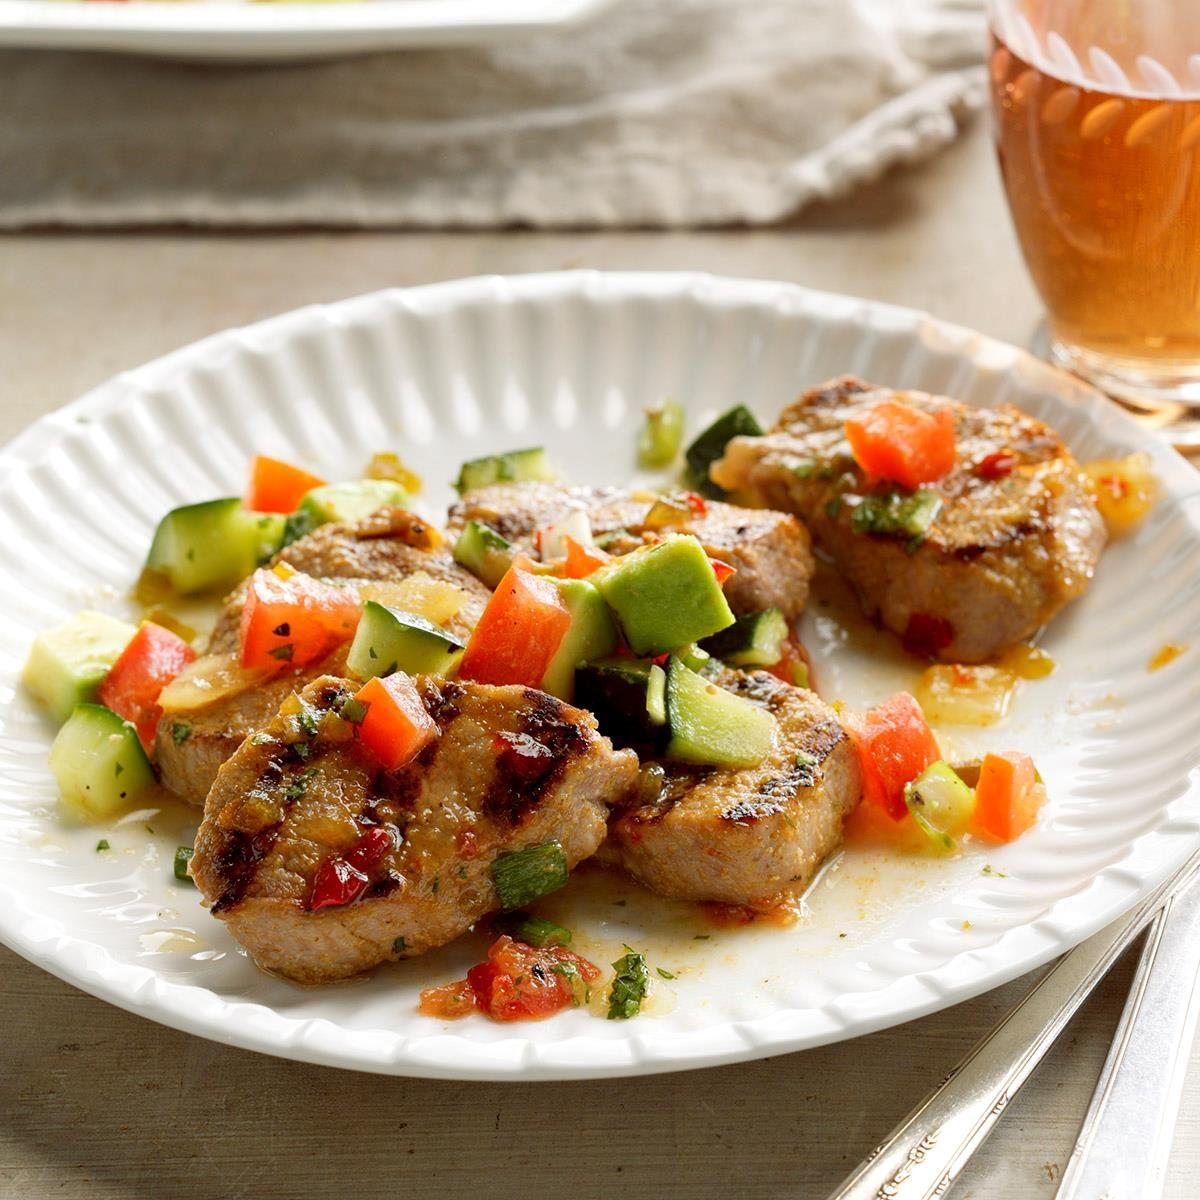 Tuesday: Grilled Pork with Avocado Salsa